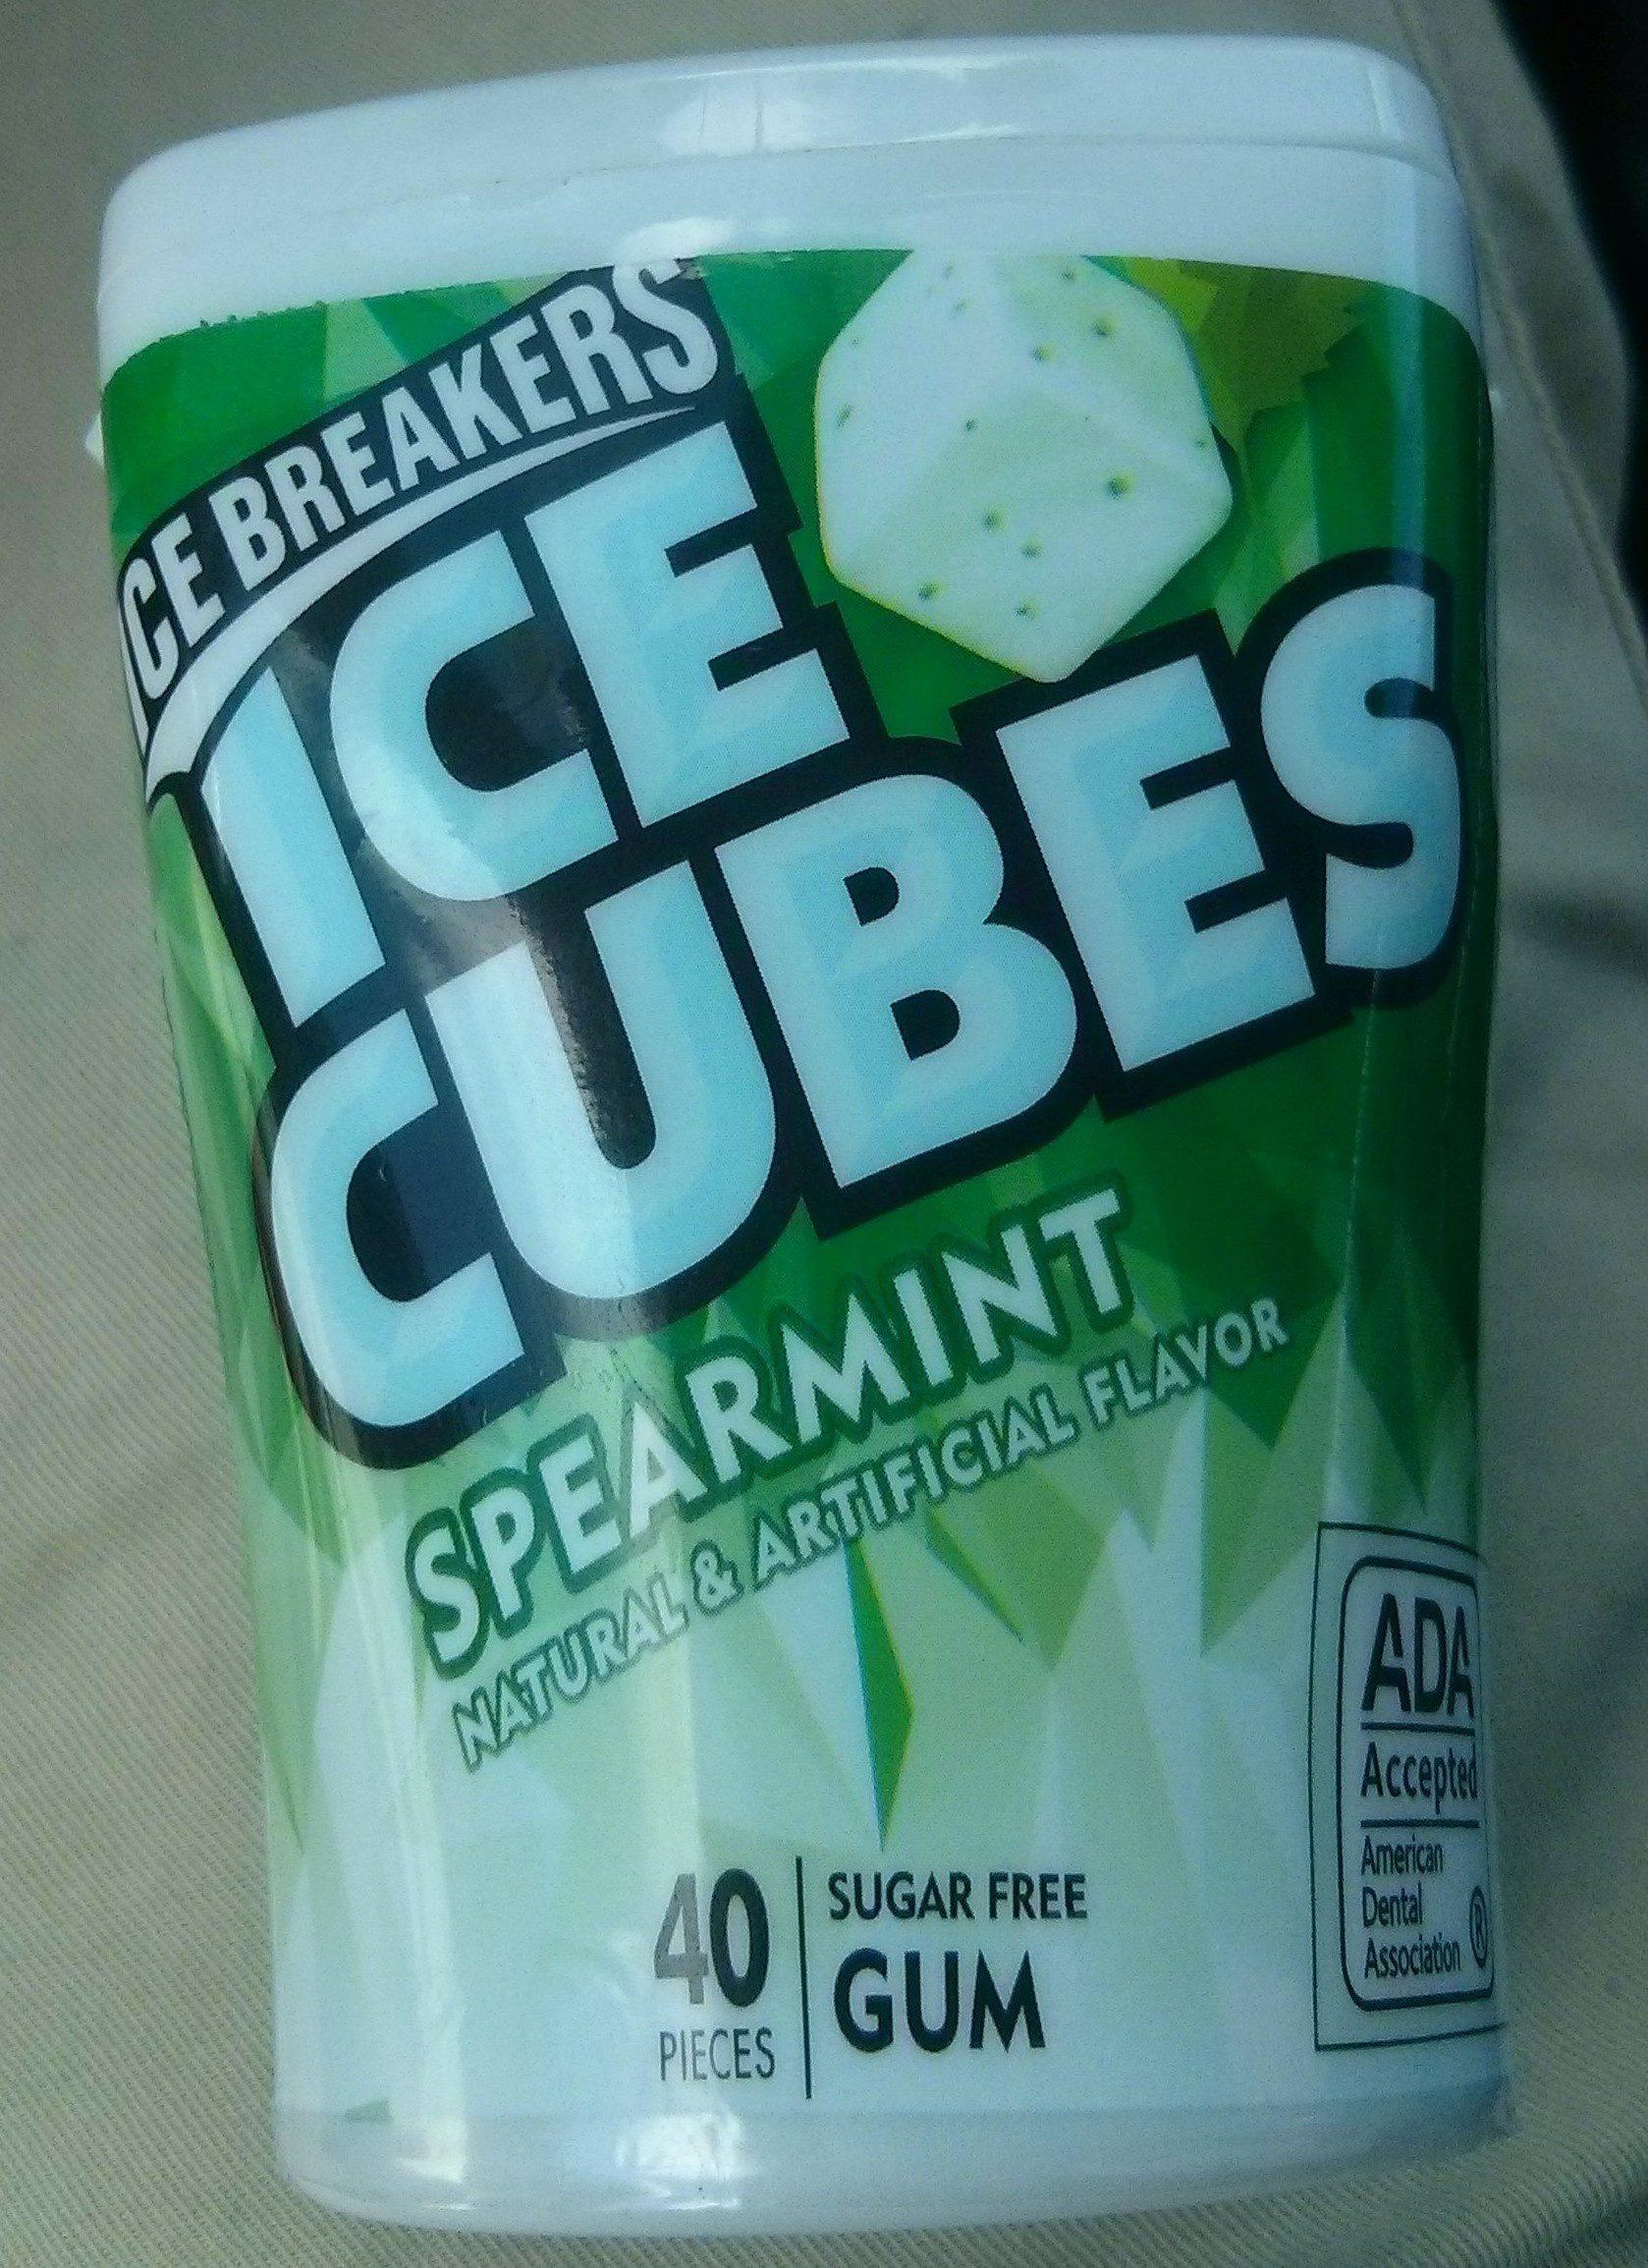 Ice cubes sugar free gum - Product - en